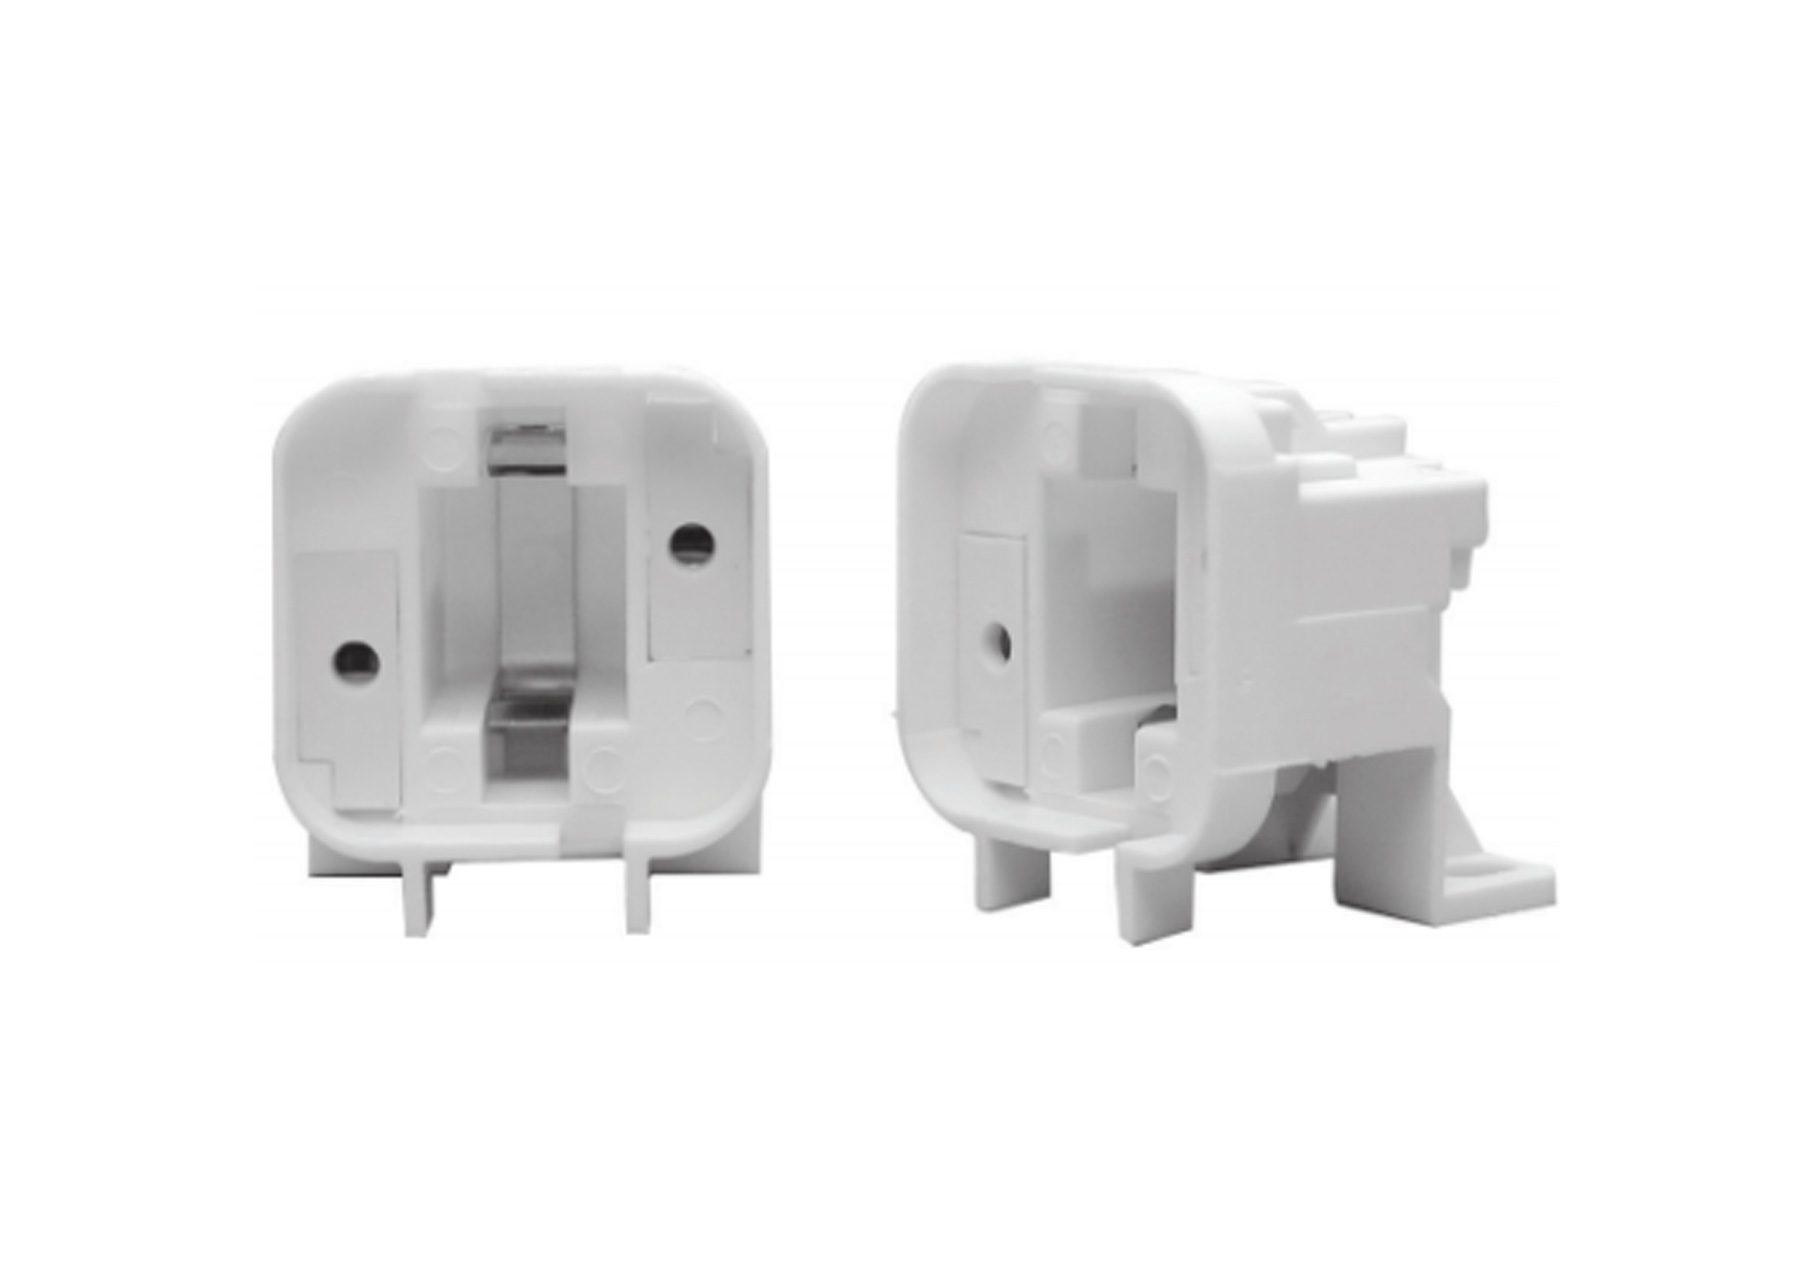 GX24-D2 CFL Light Socket